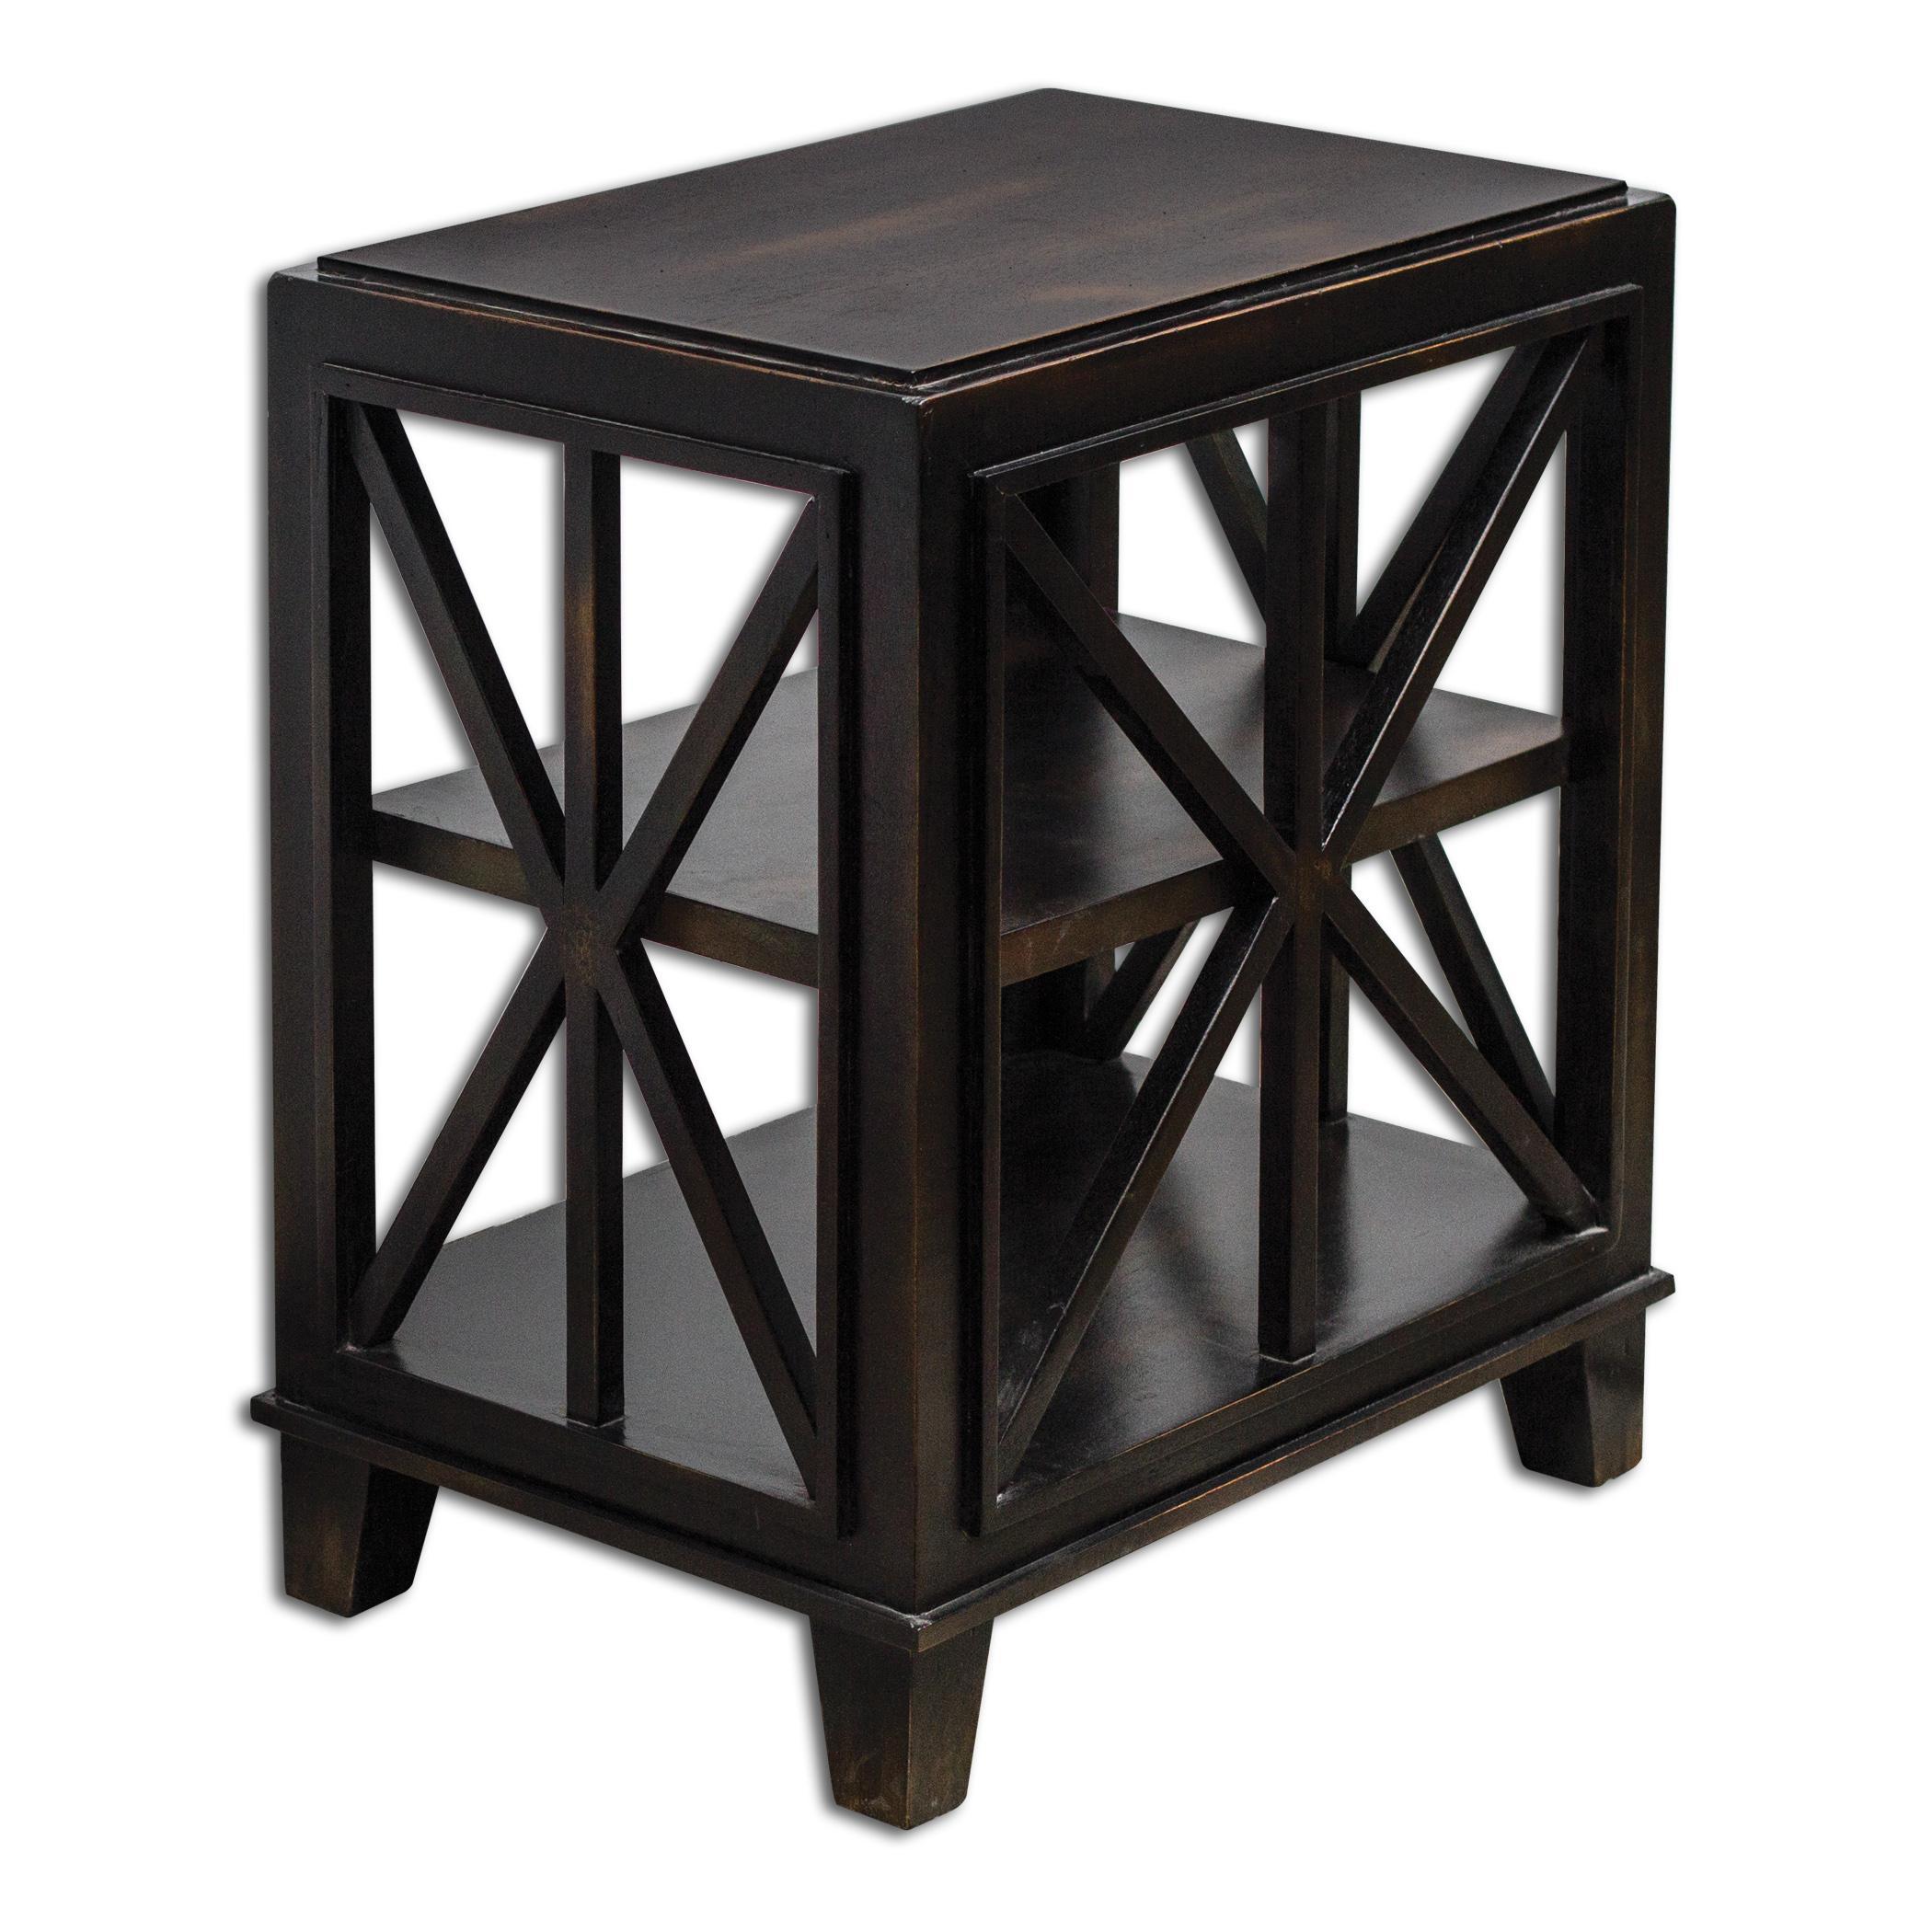 Uttermost Accent Furniture Asadel End Table - Item Number: 25633